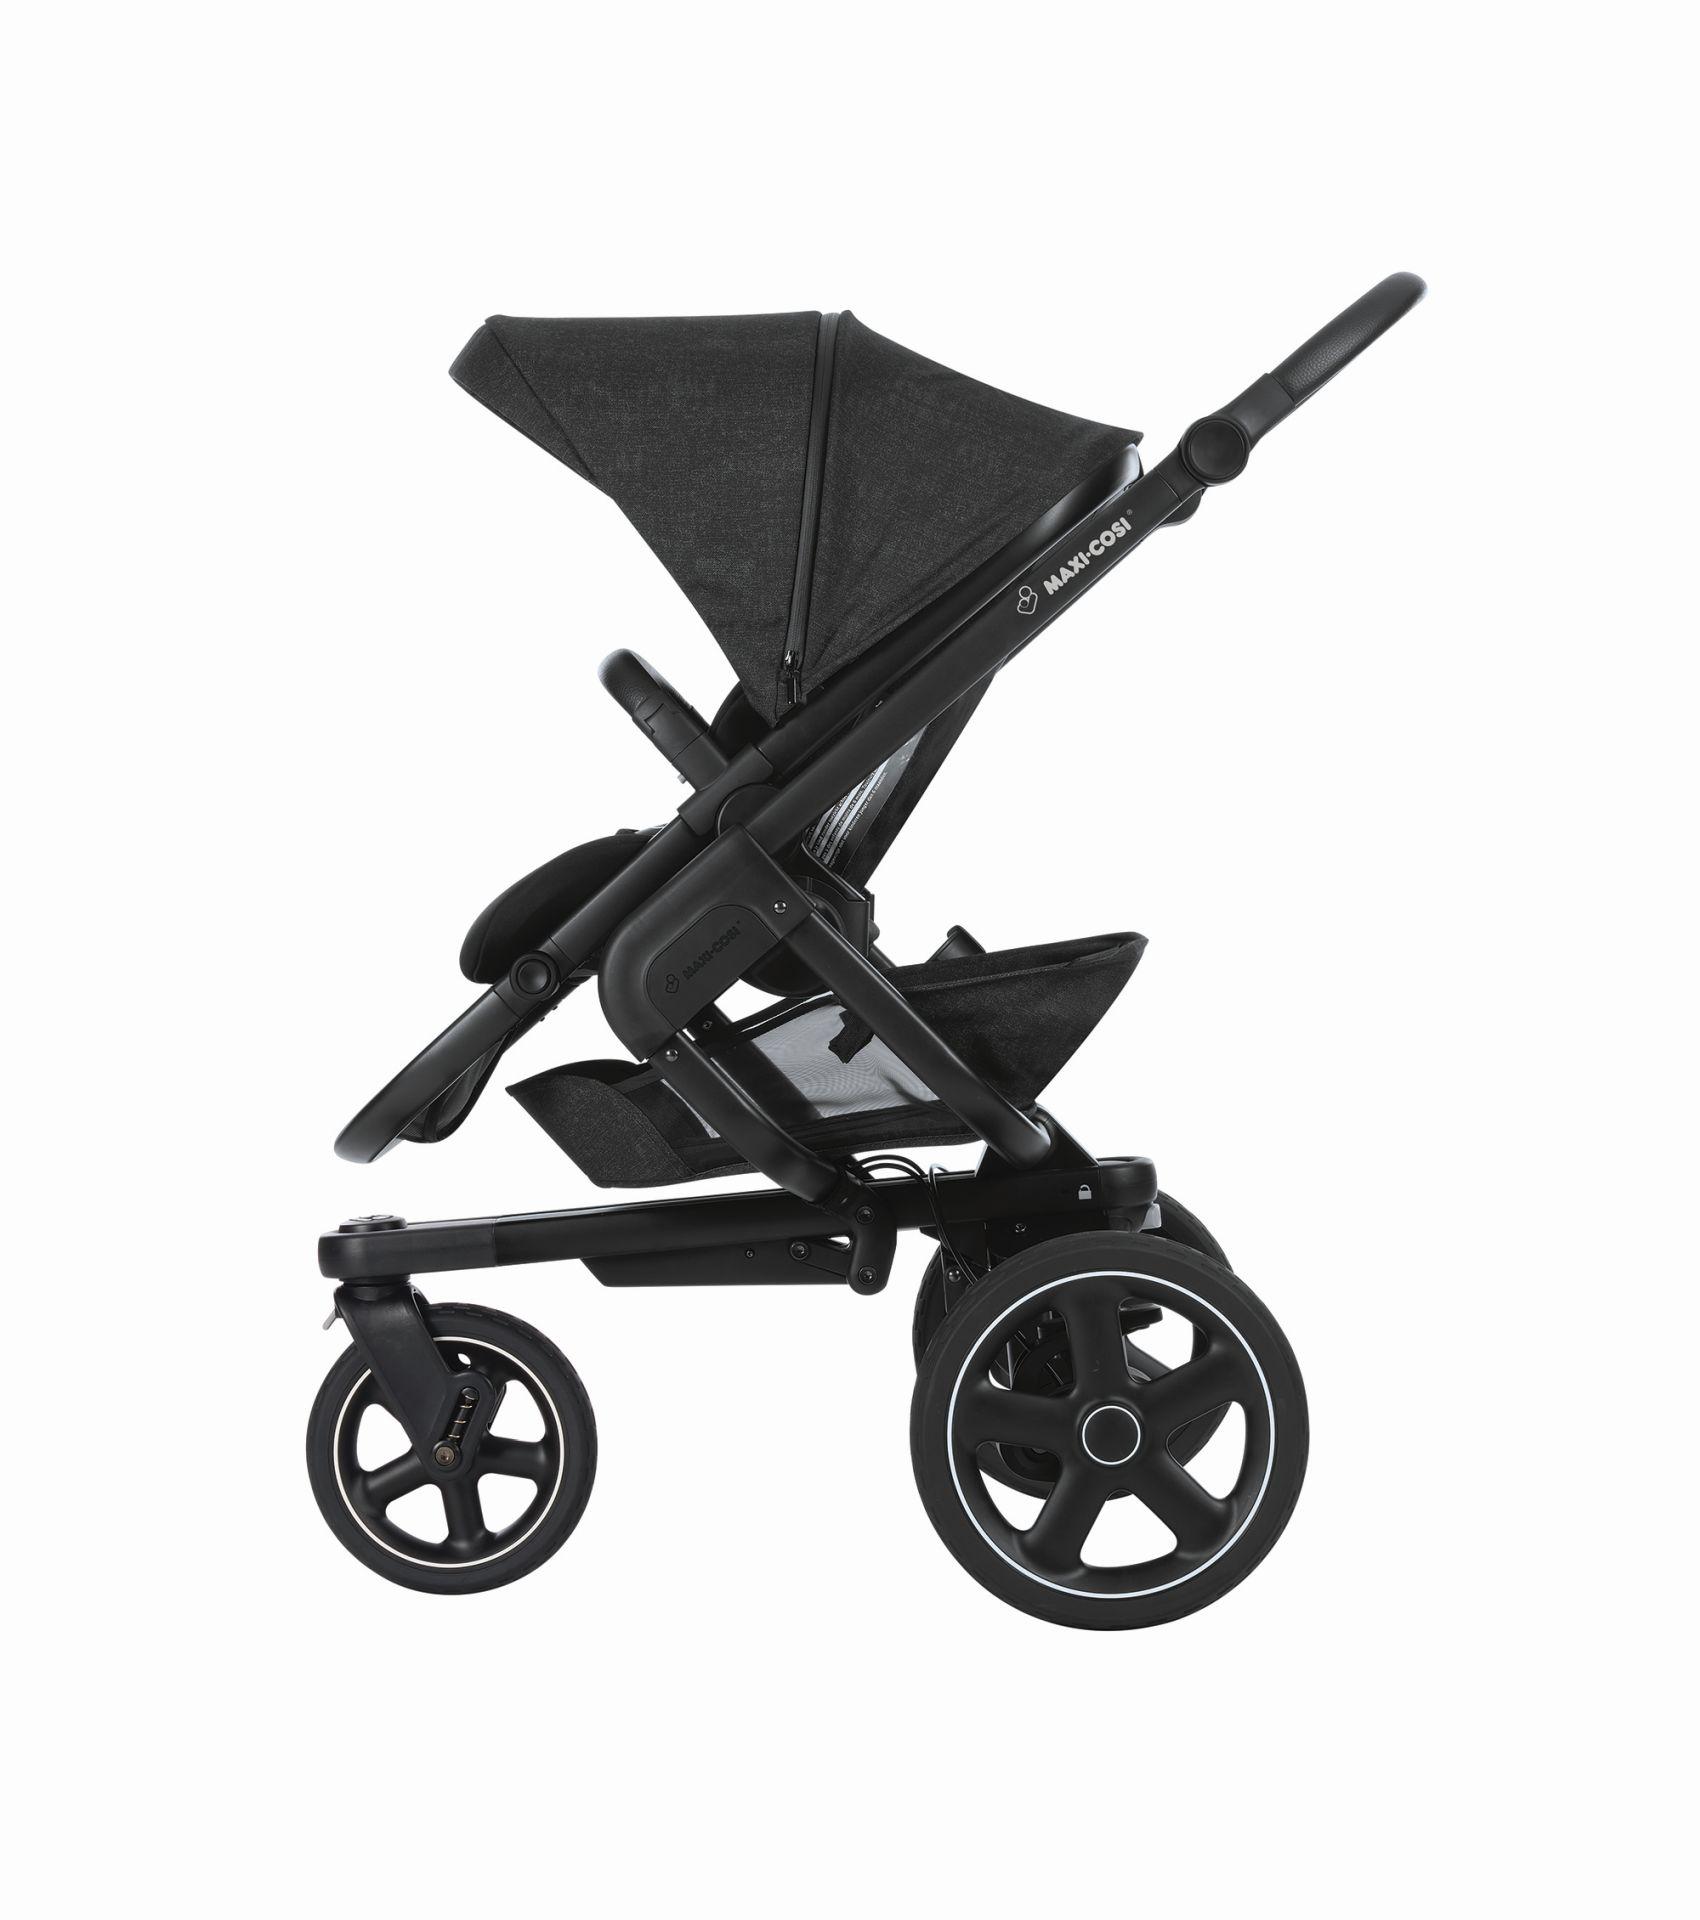 maxi cosi kinderwagen nova 3 rad 2018 nomad sand online kaufen bei kidsroom kinderwagen. Black Bedroom Furniture Sets. Home Design Ideas